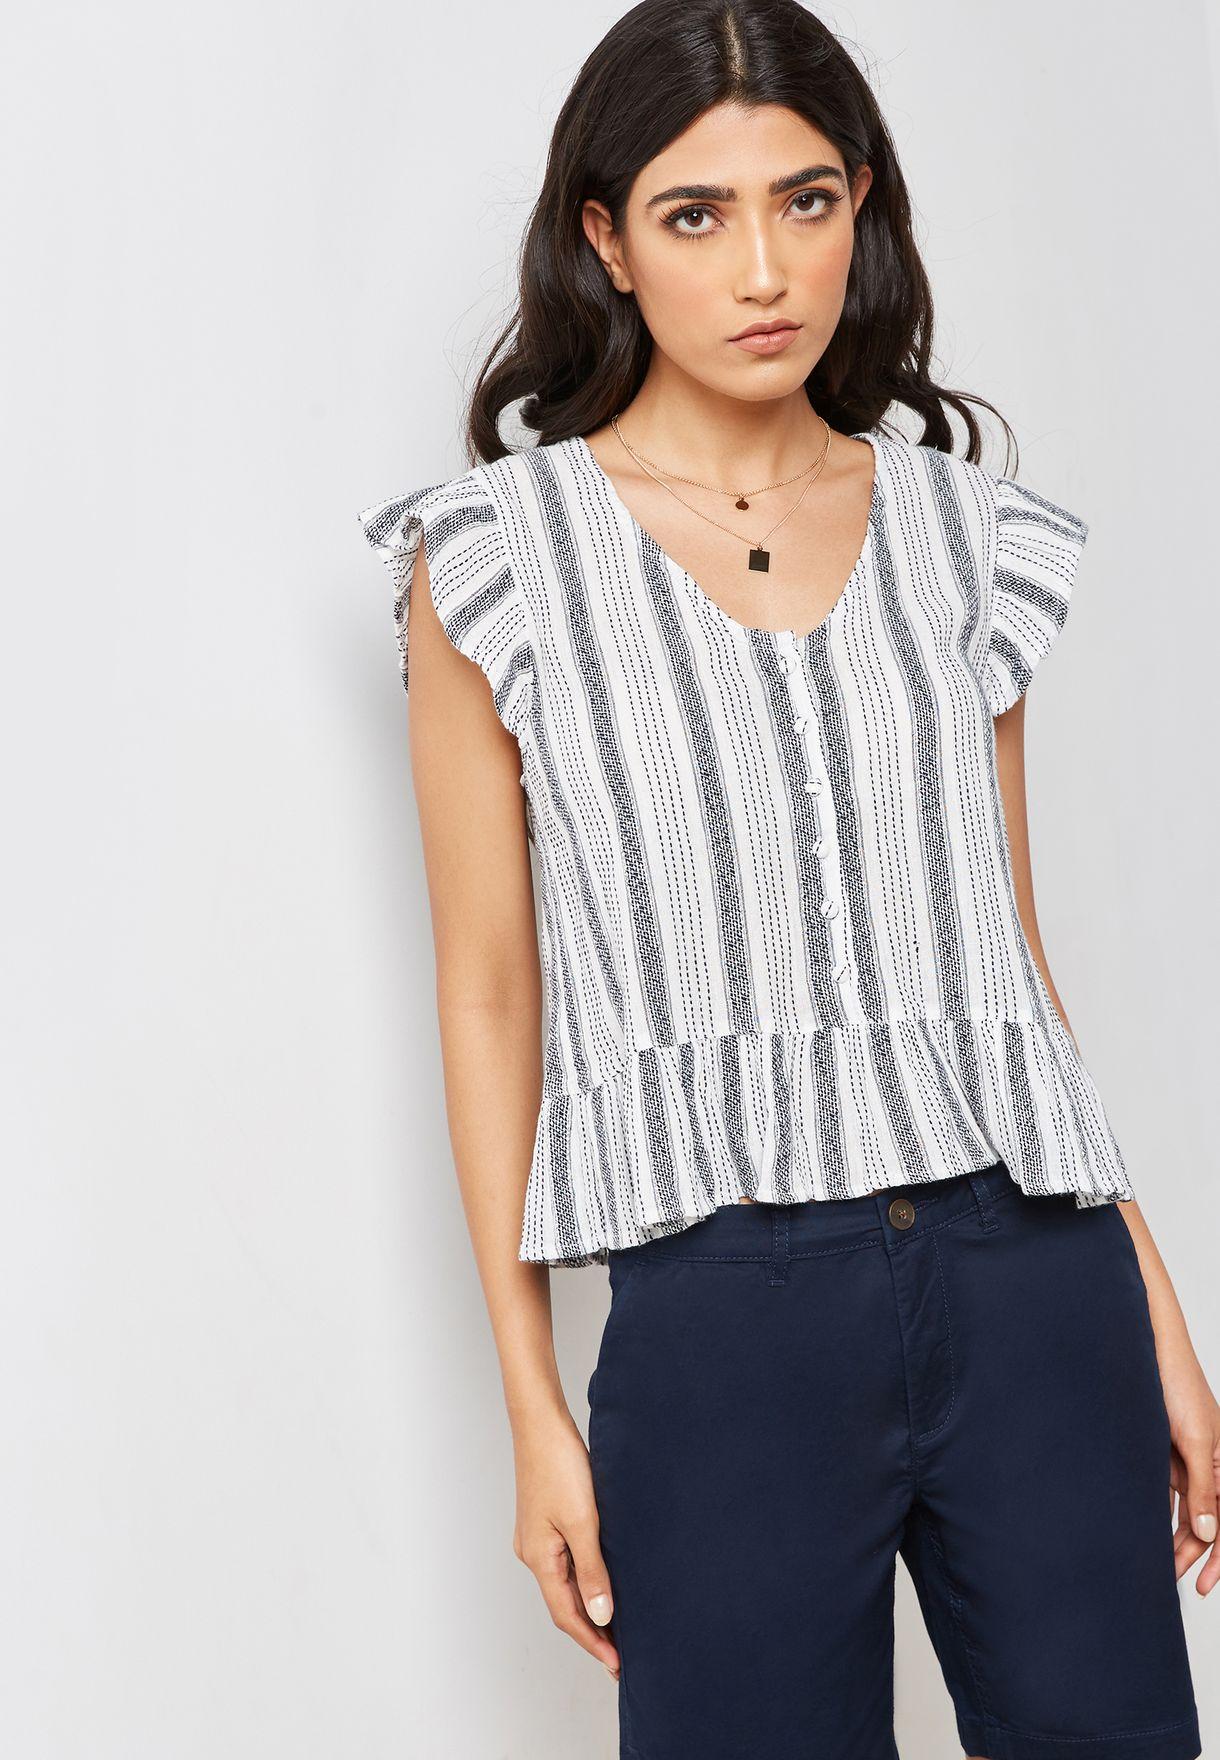 032c317299 Shop Mango monochrome Striped Ruffle Detail Top 43930524 for Women ...